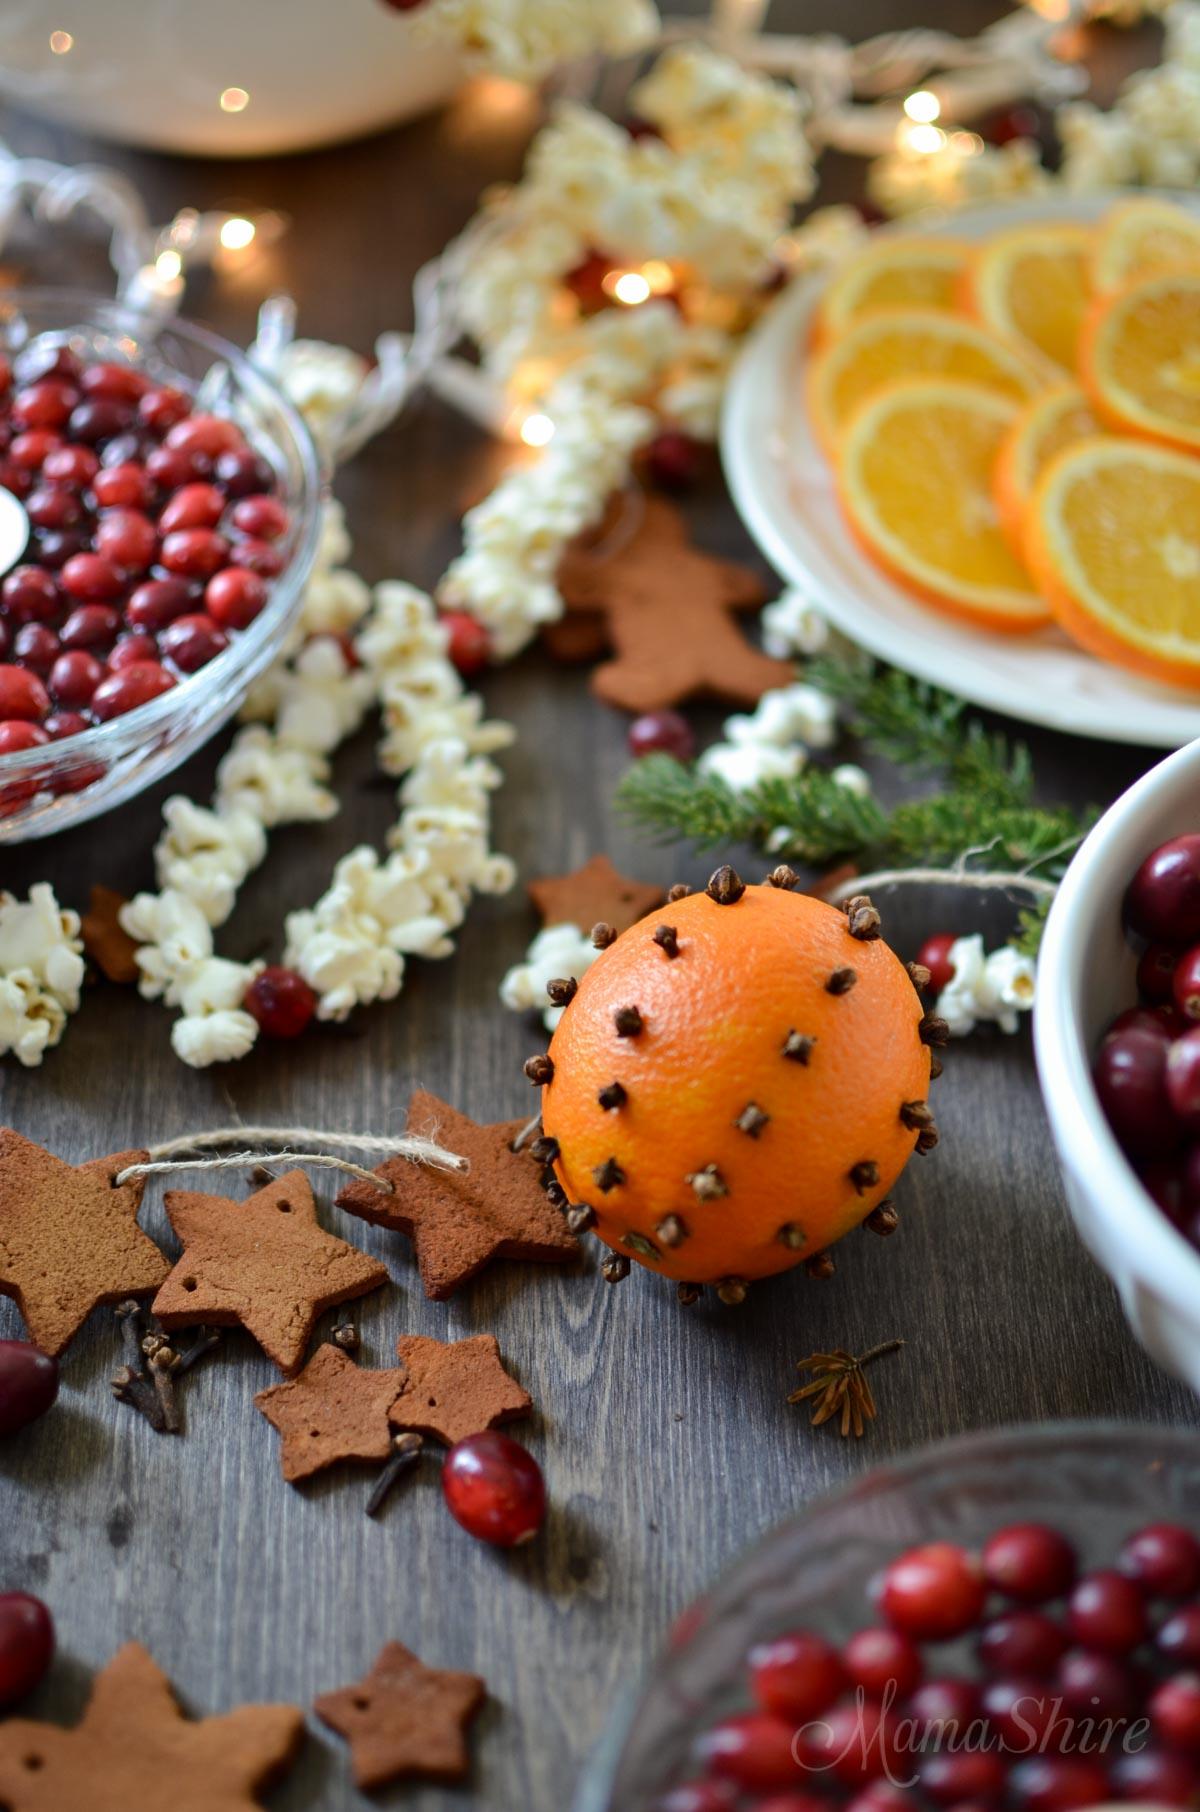 Christmas Decorations From The Kitchen Mamashiremamashire